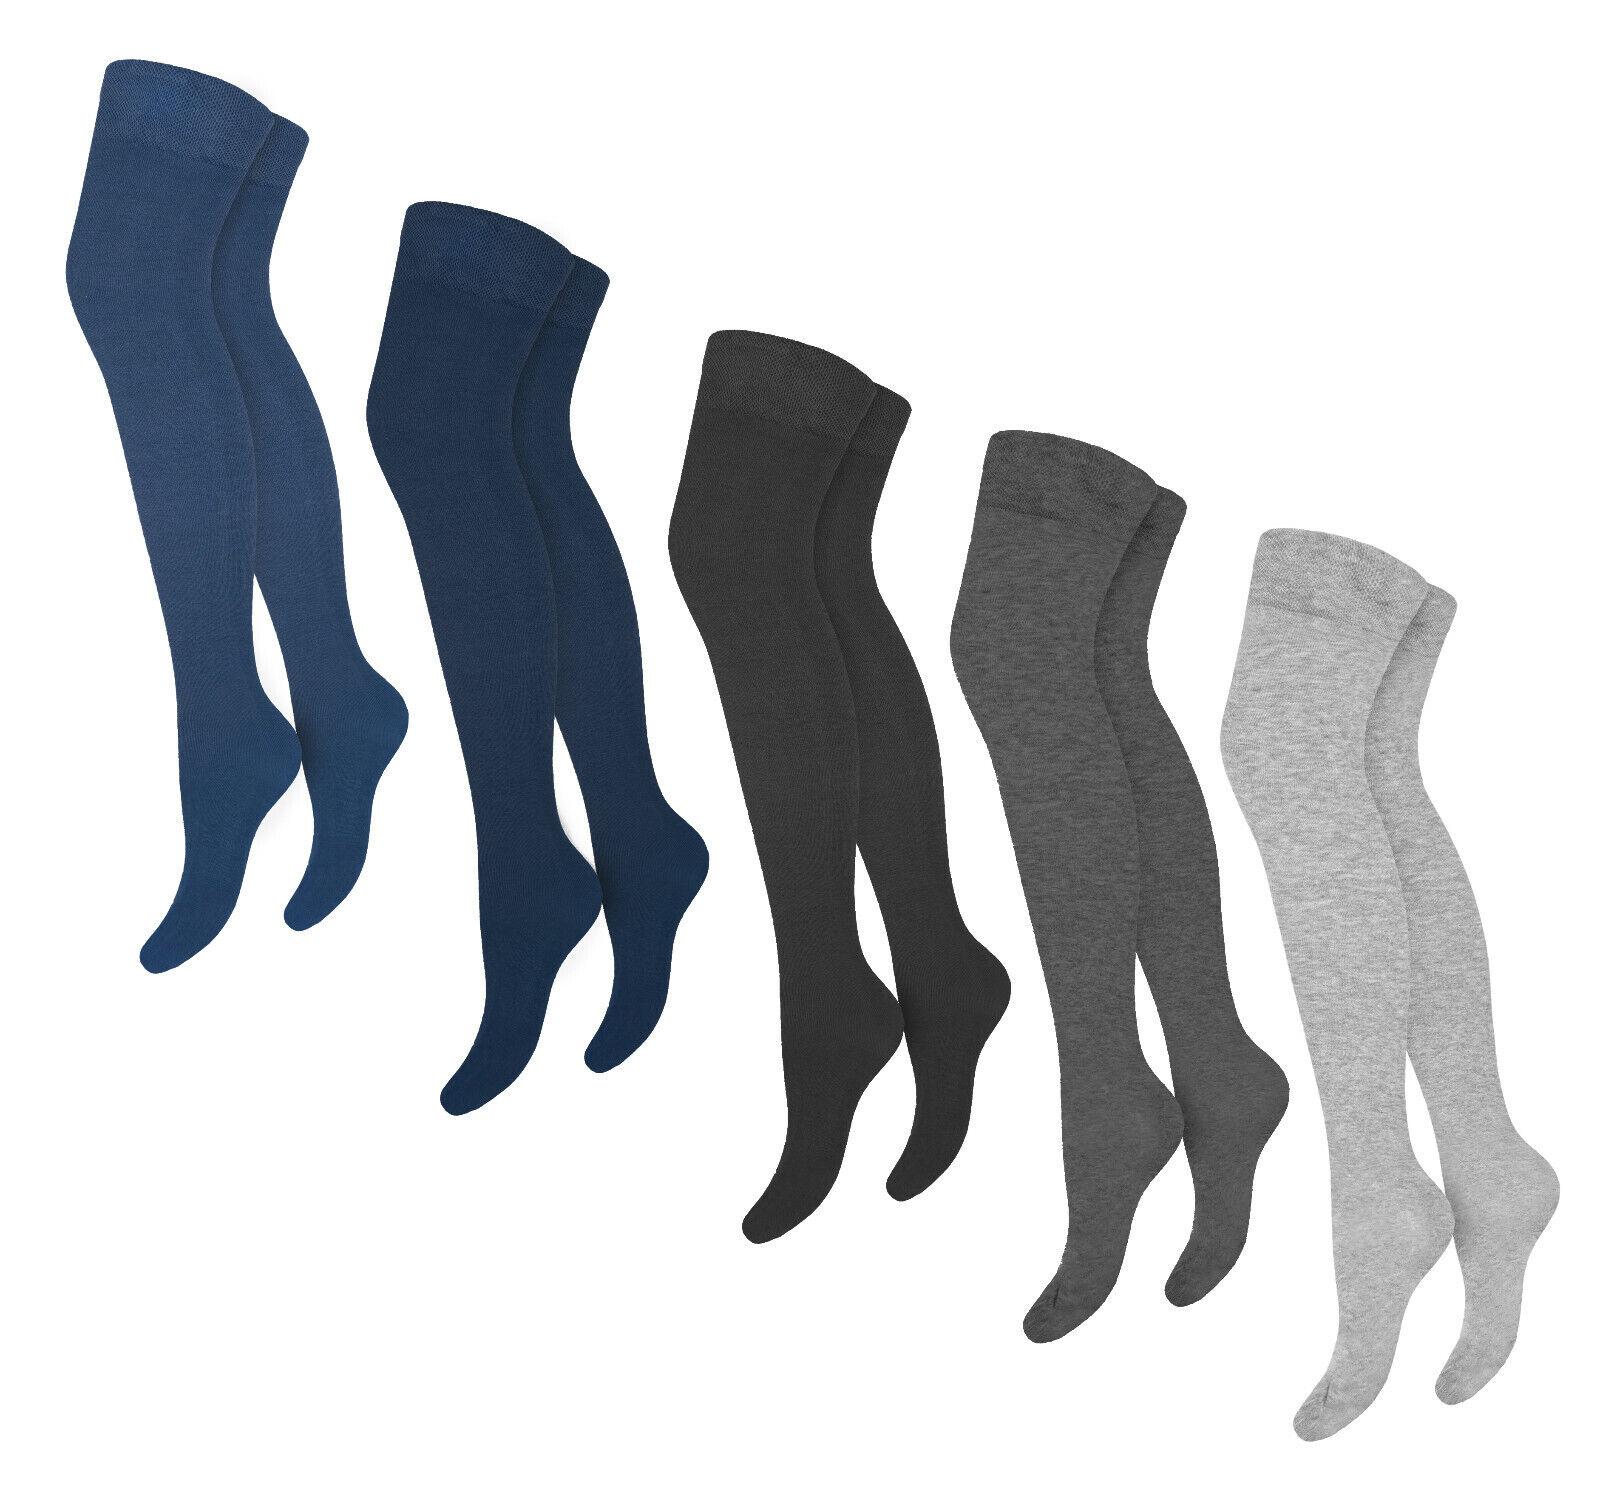 Overknees Strümpfe Überkniestrümpfe Kostüm Overknee Qualität Overknees Socken